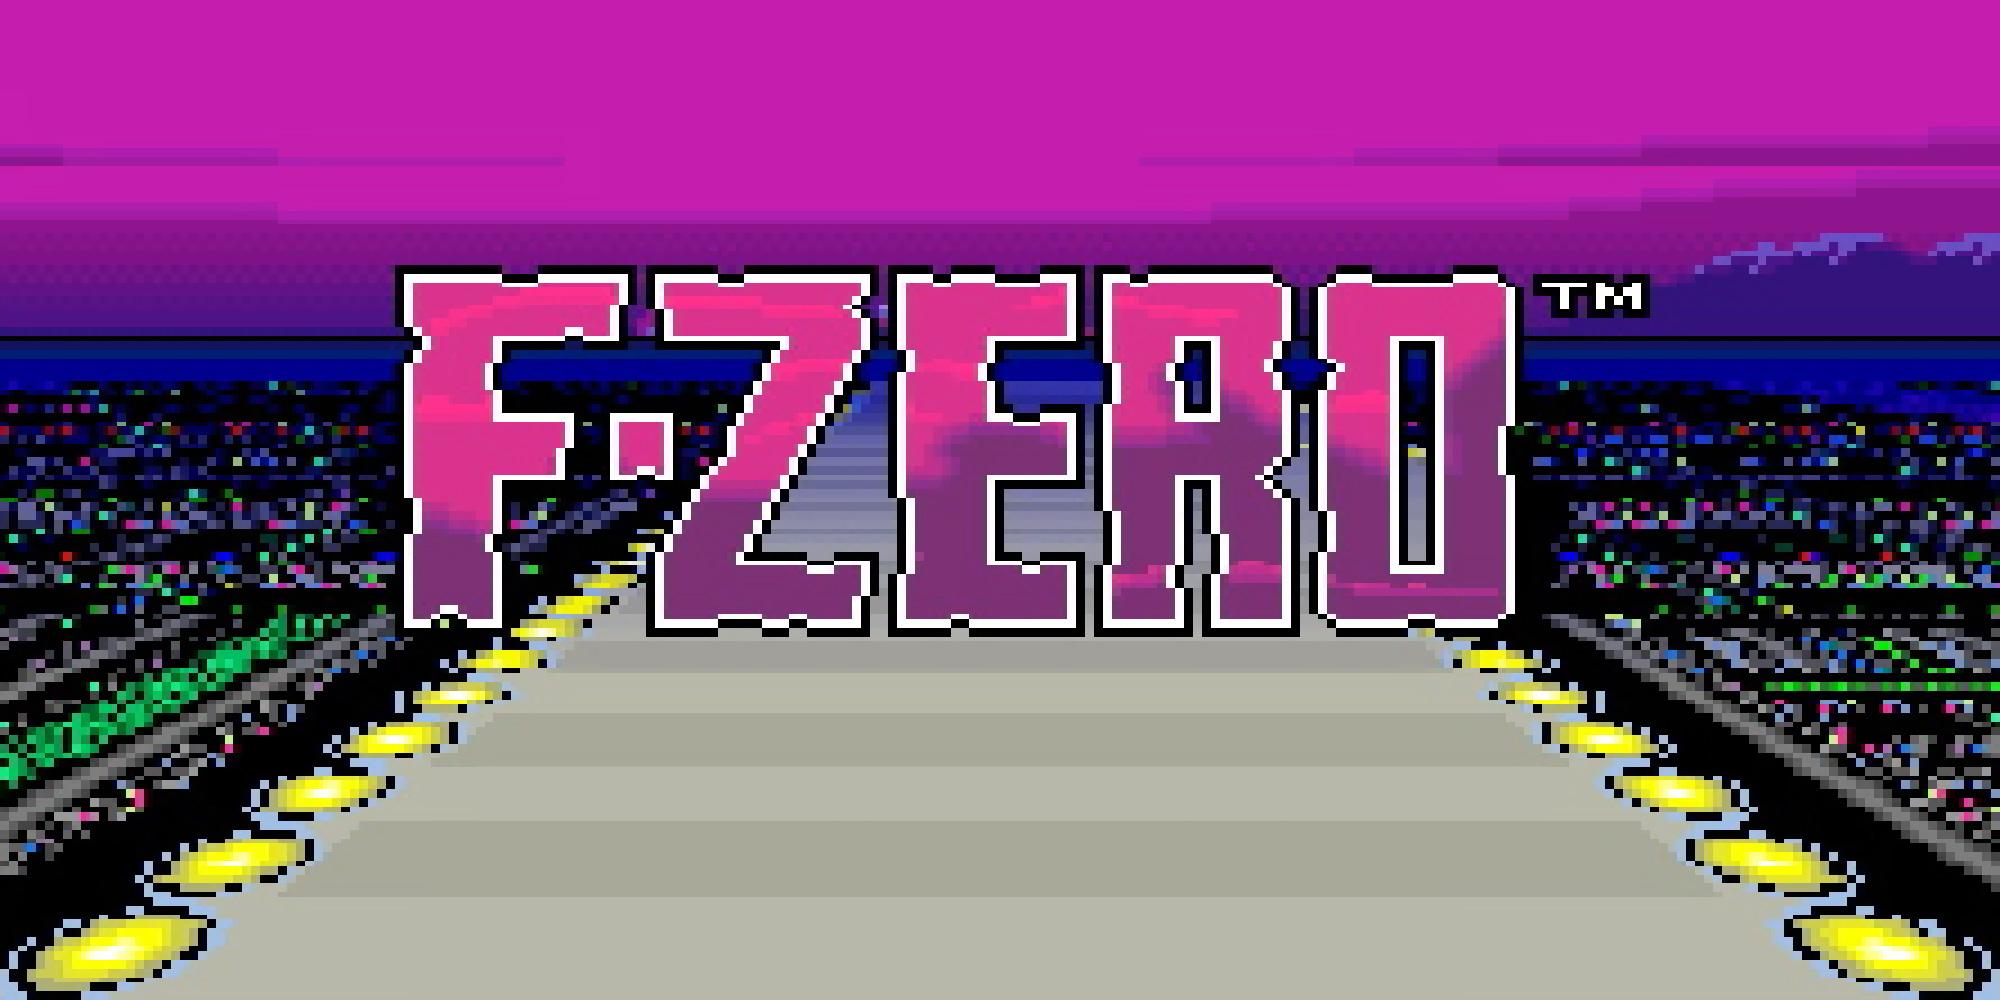 F-ZERO | Super Nintendo | Games | Nintendo